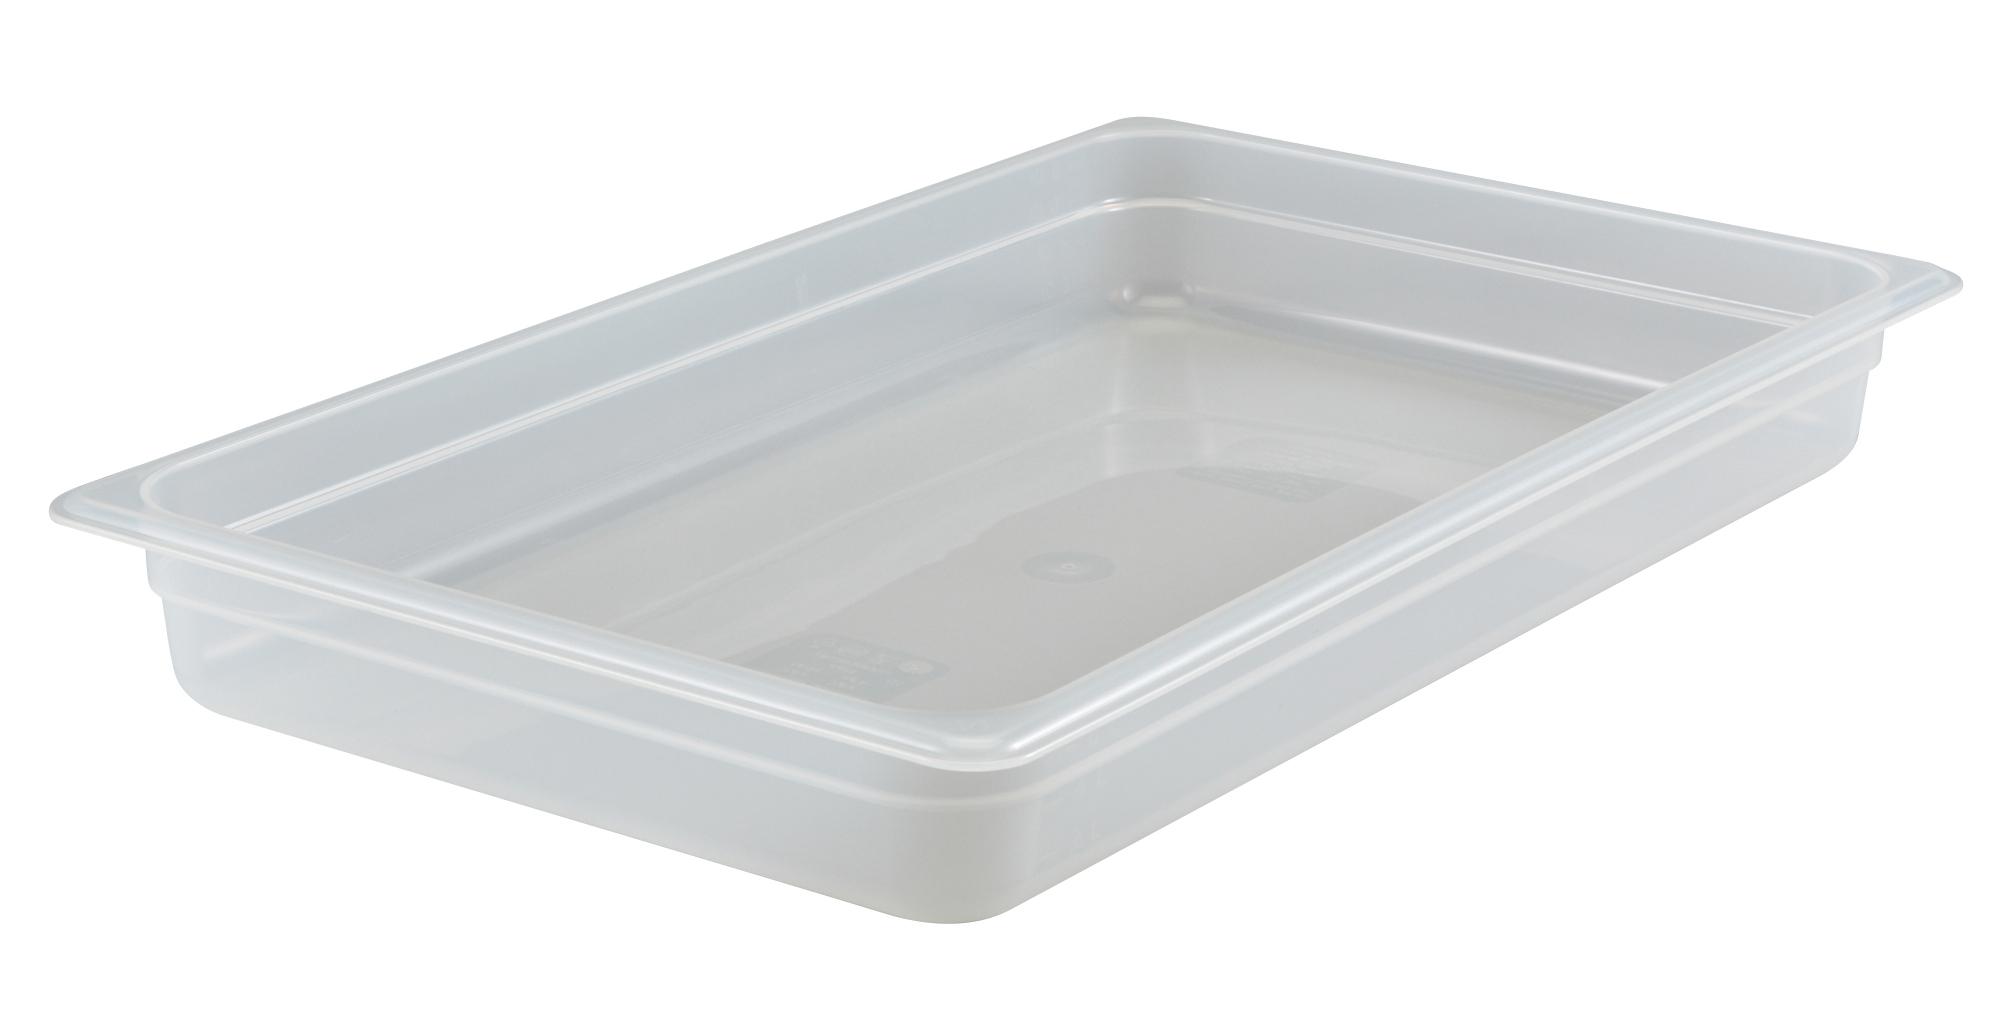 Cambro 14PP190 food/beverage storage container